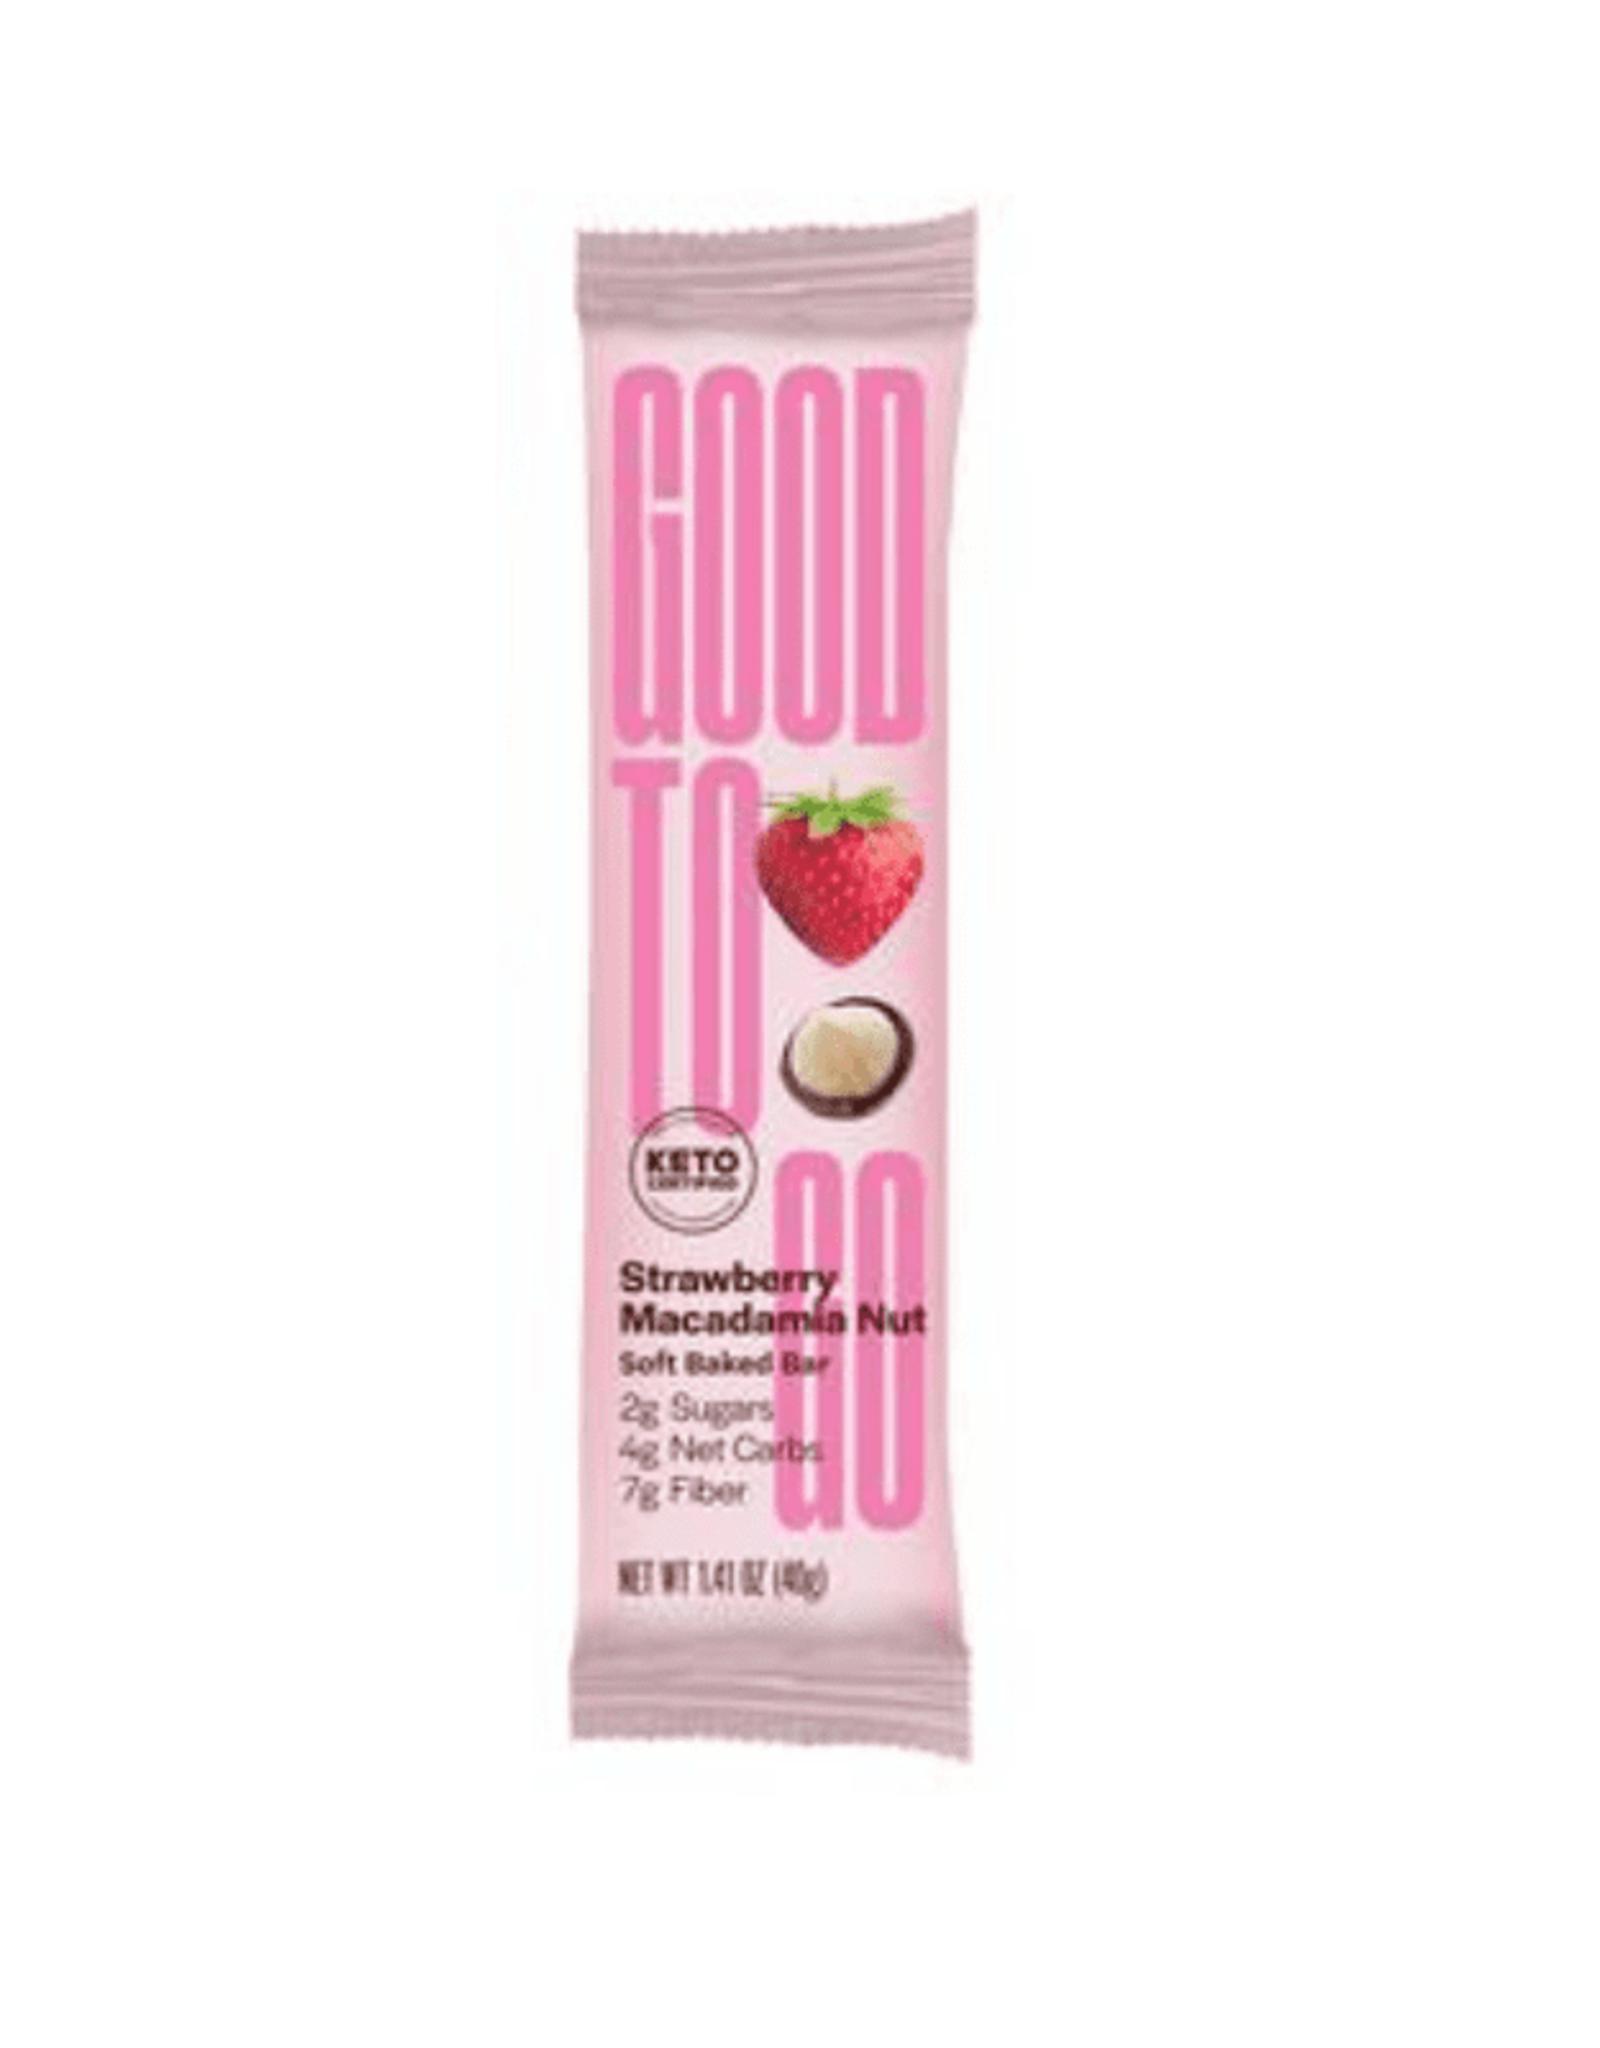 Good To Go Good To Go - Keto Bar, Strawberry Macadamia (40g)